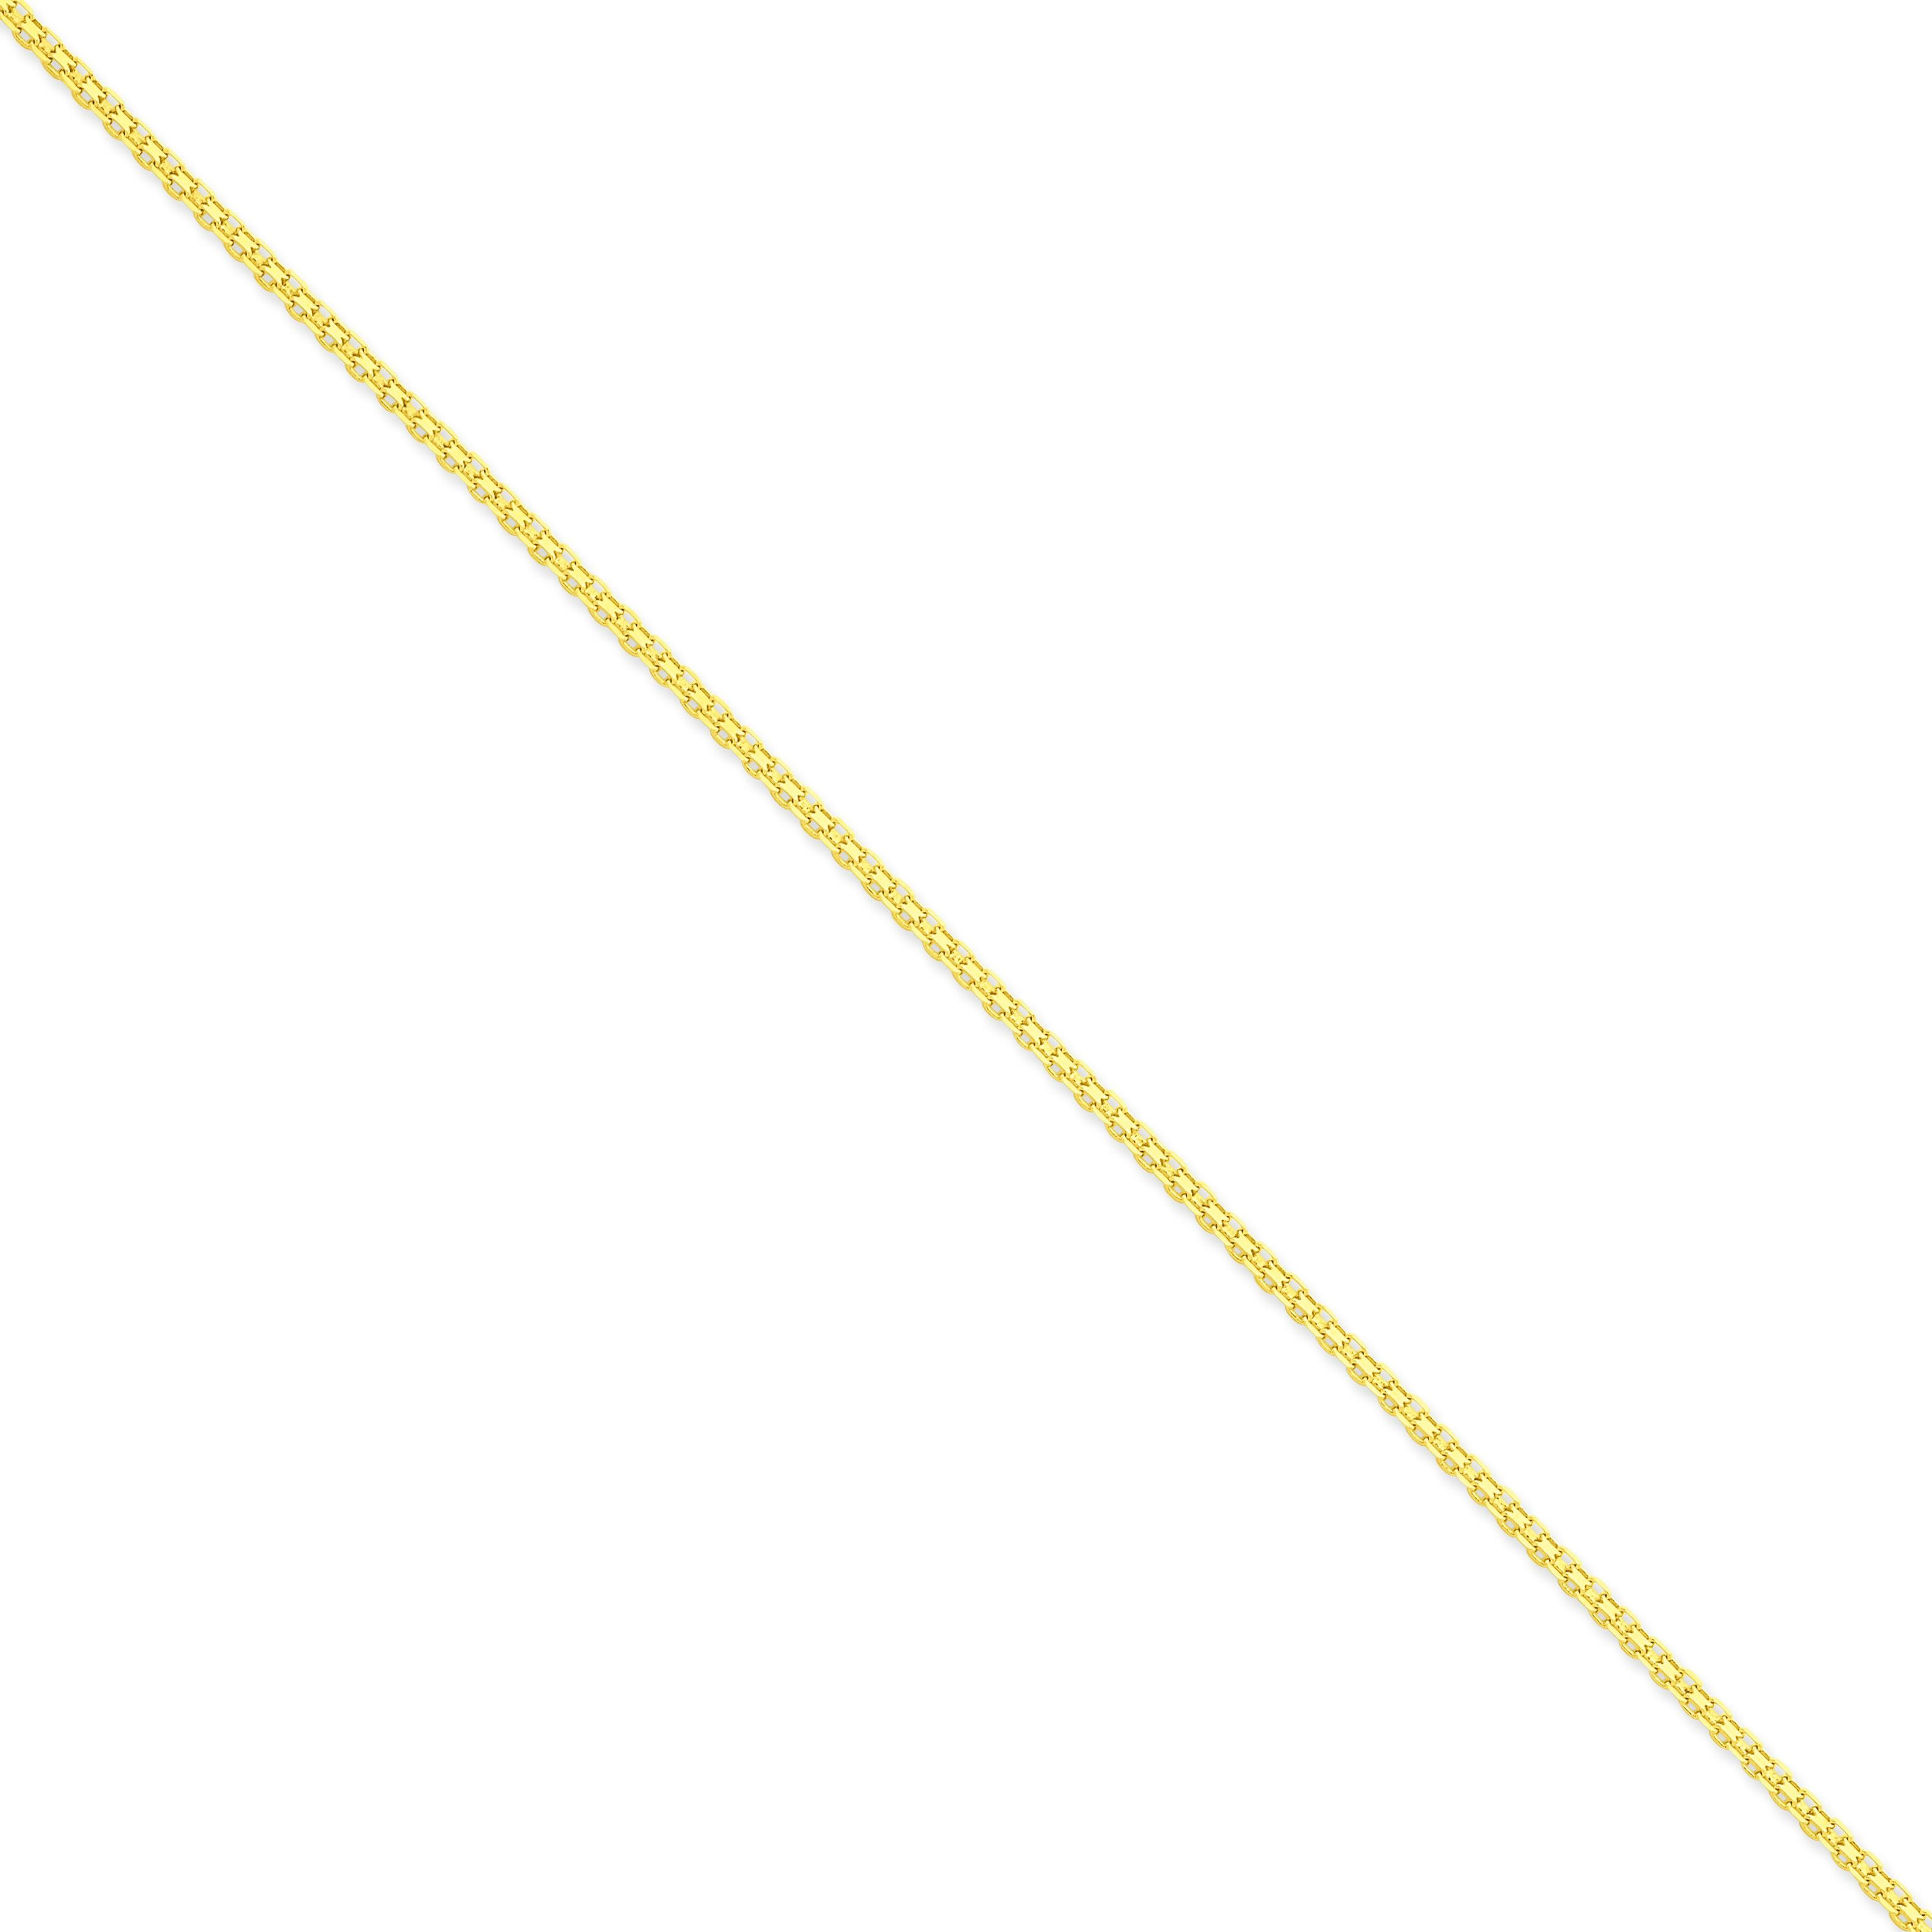 14k Yellow Gold 7 inch 2.00 mm Bismark Flat Chain Bracelet